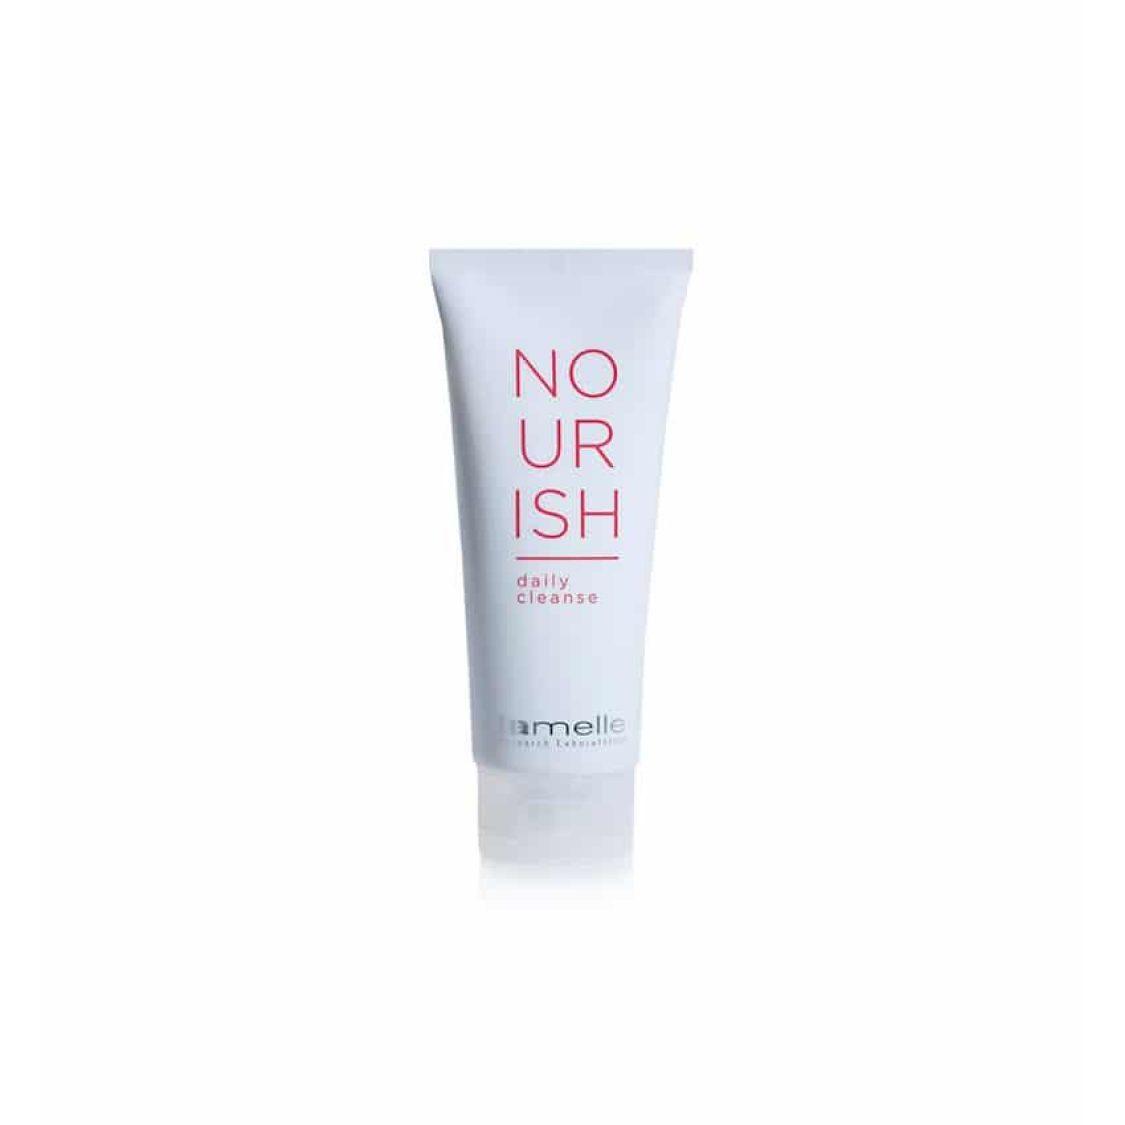 Lamelle - Nourish Daily Cleanse 250ml